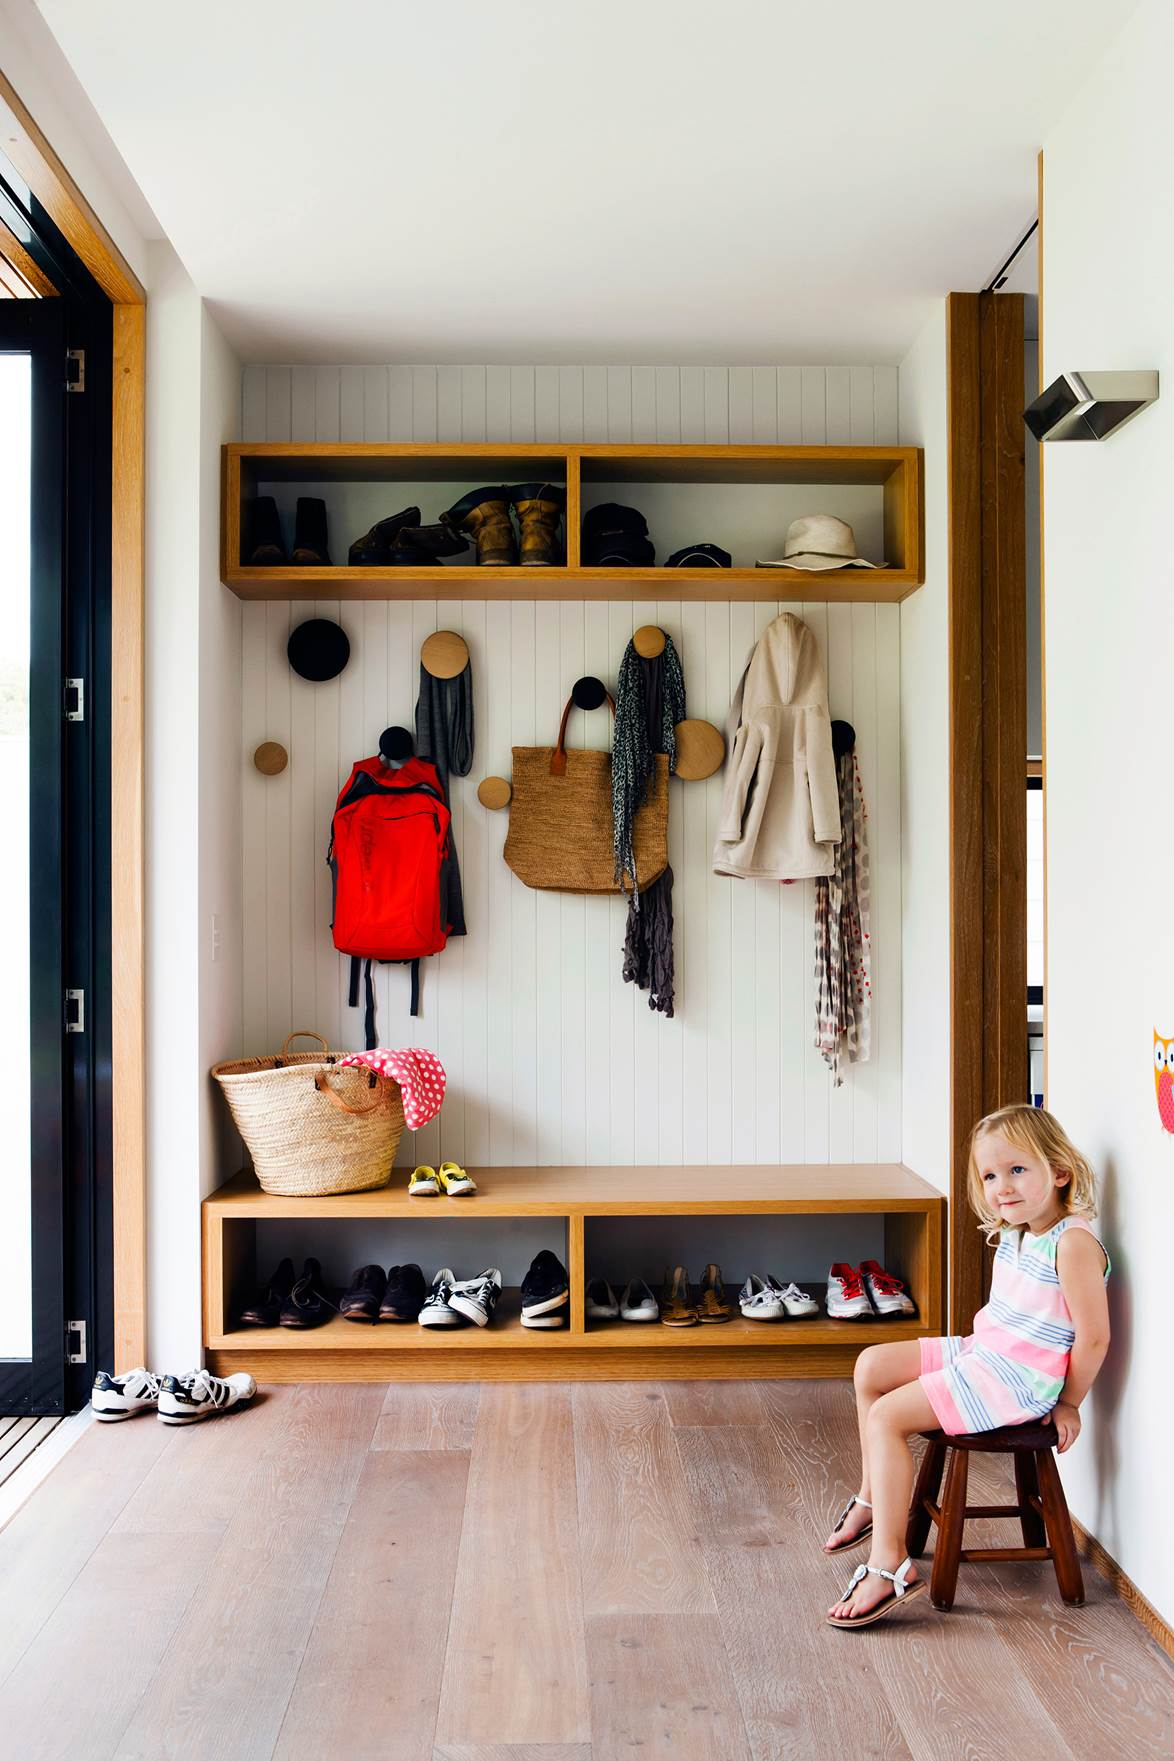 example of kid friendly mudroom image